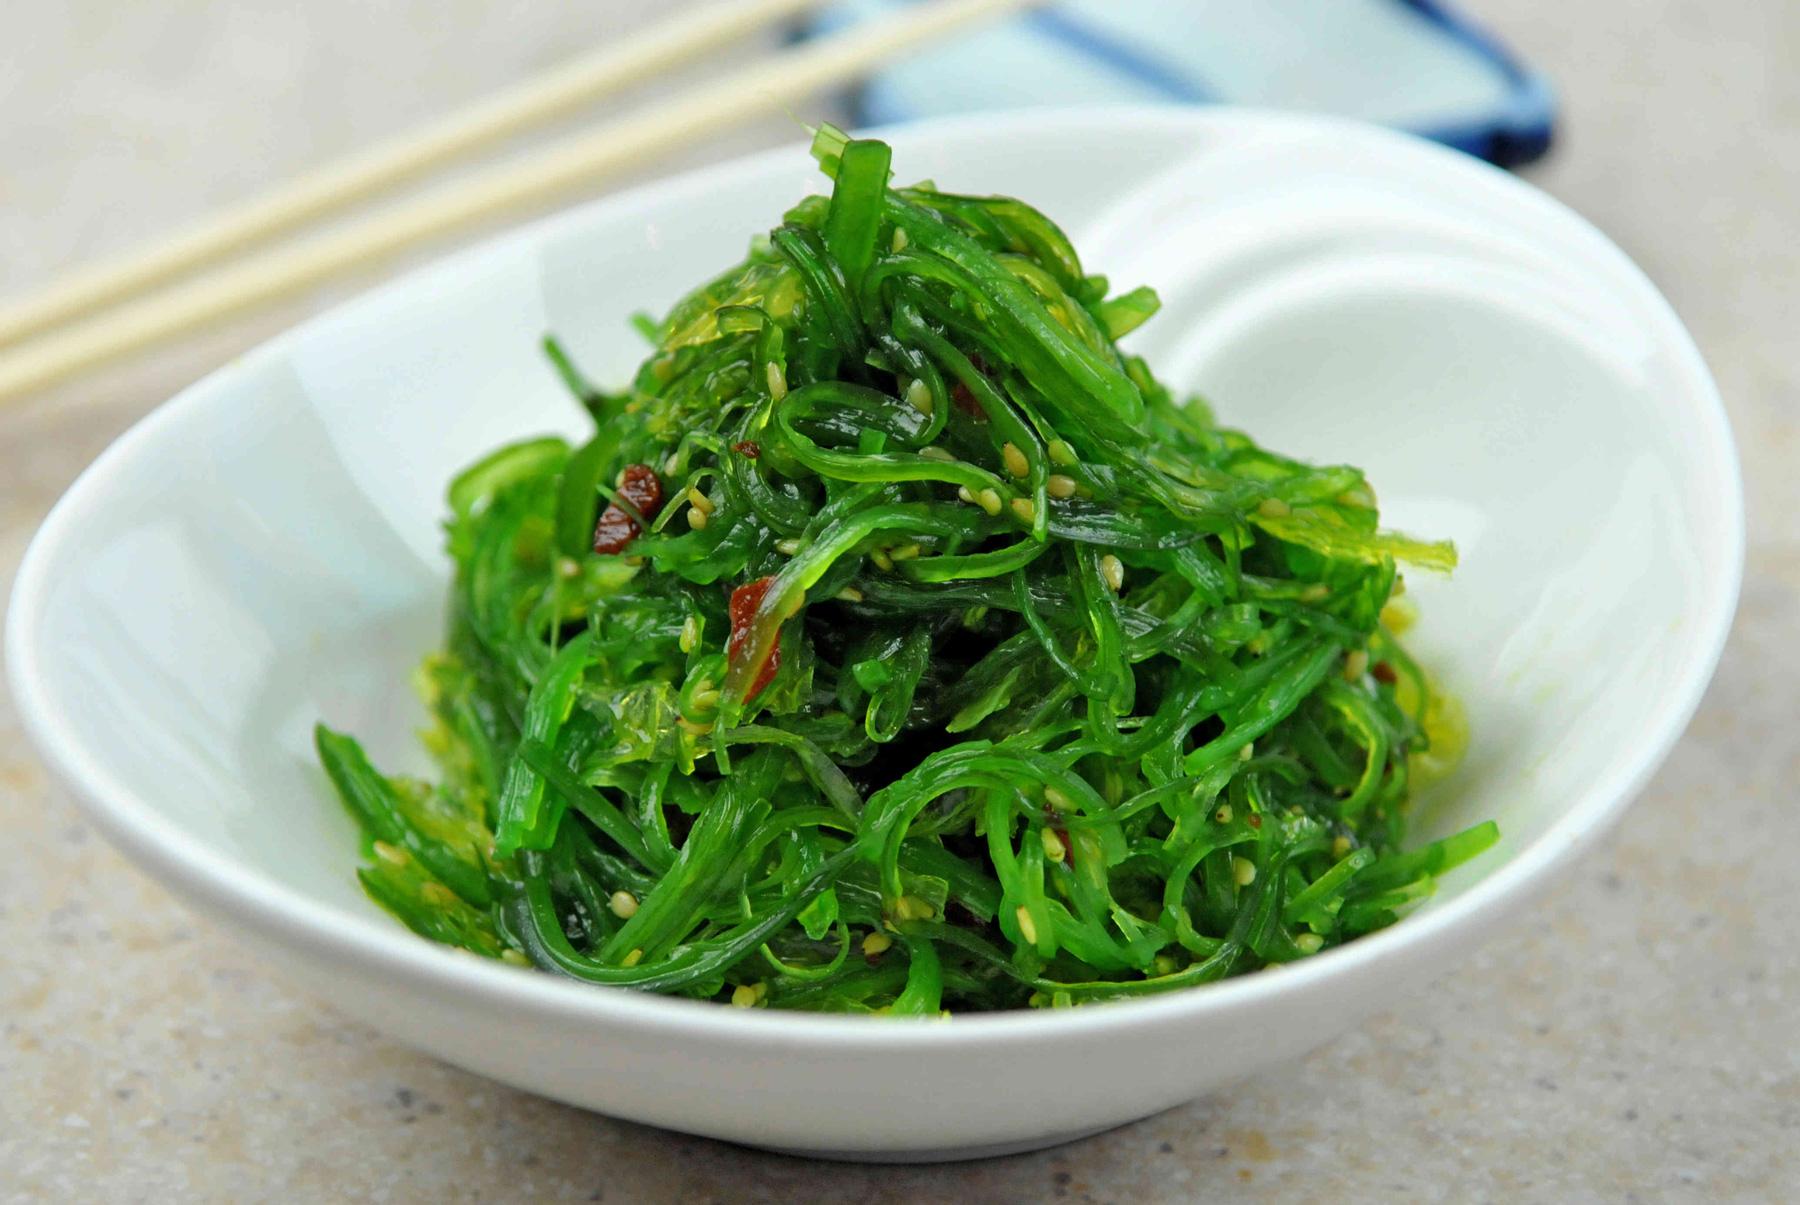 hight resolution of seaweed the popular sea veggie jane dummer rd